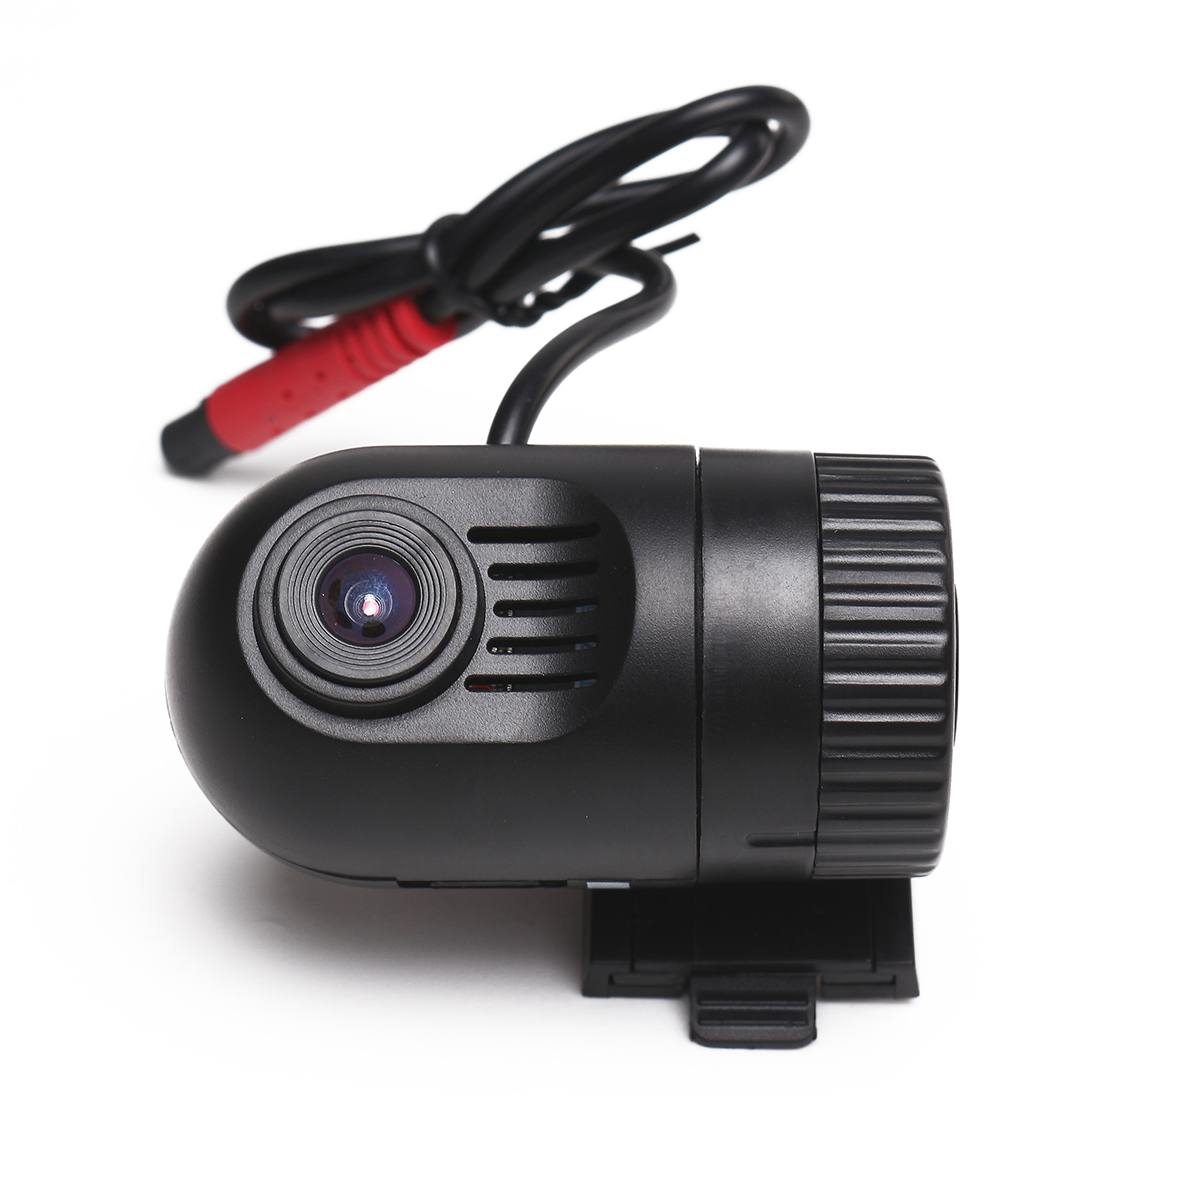 HD DVR Vehicles-Camera Video-Recorder Car-Accessories Dash-Cam Night-Vision Auto-Car